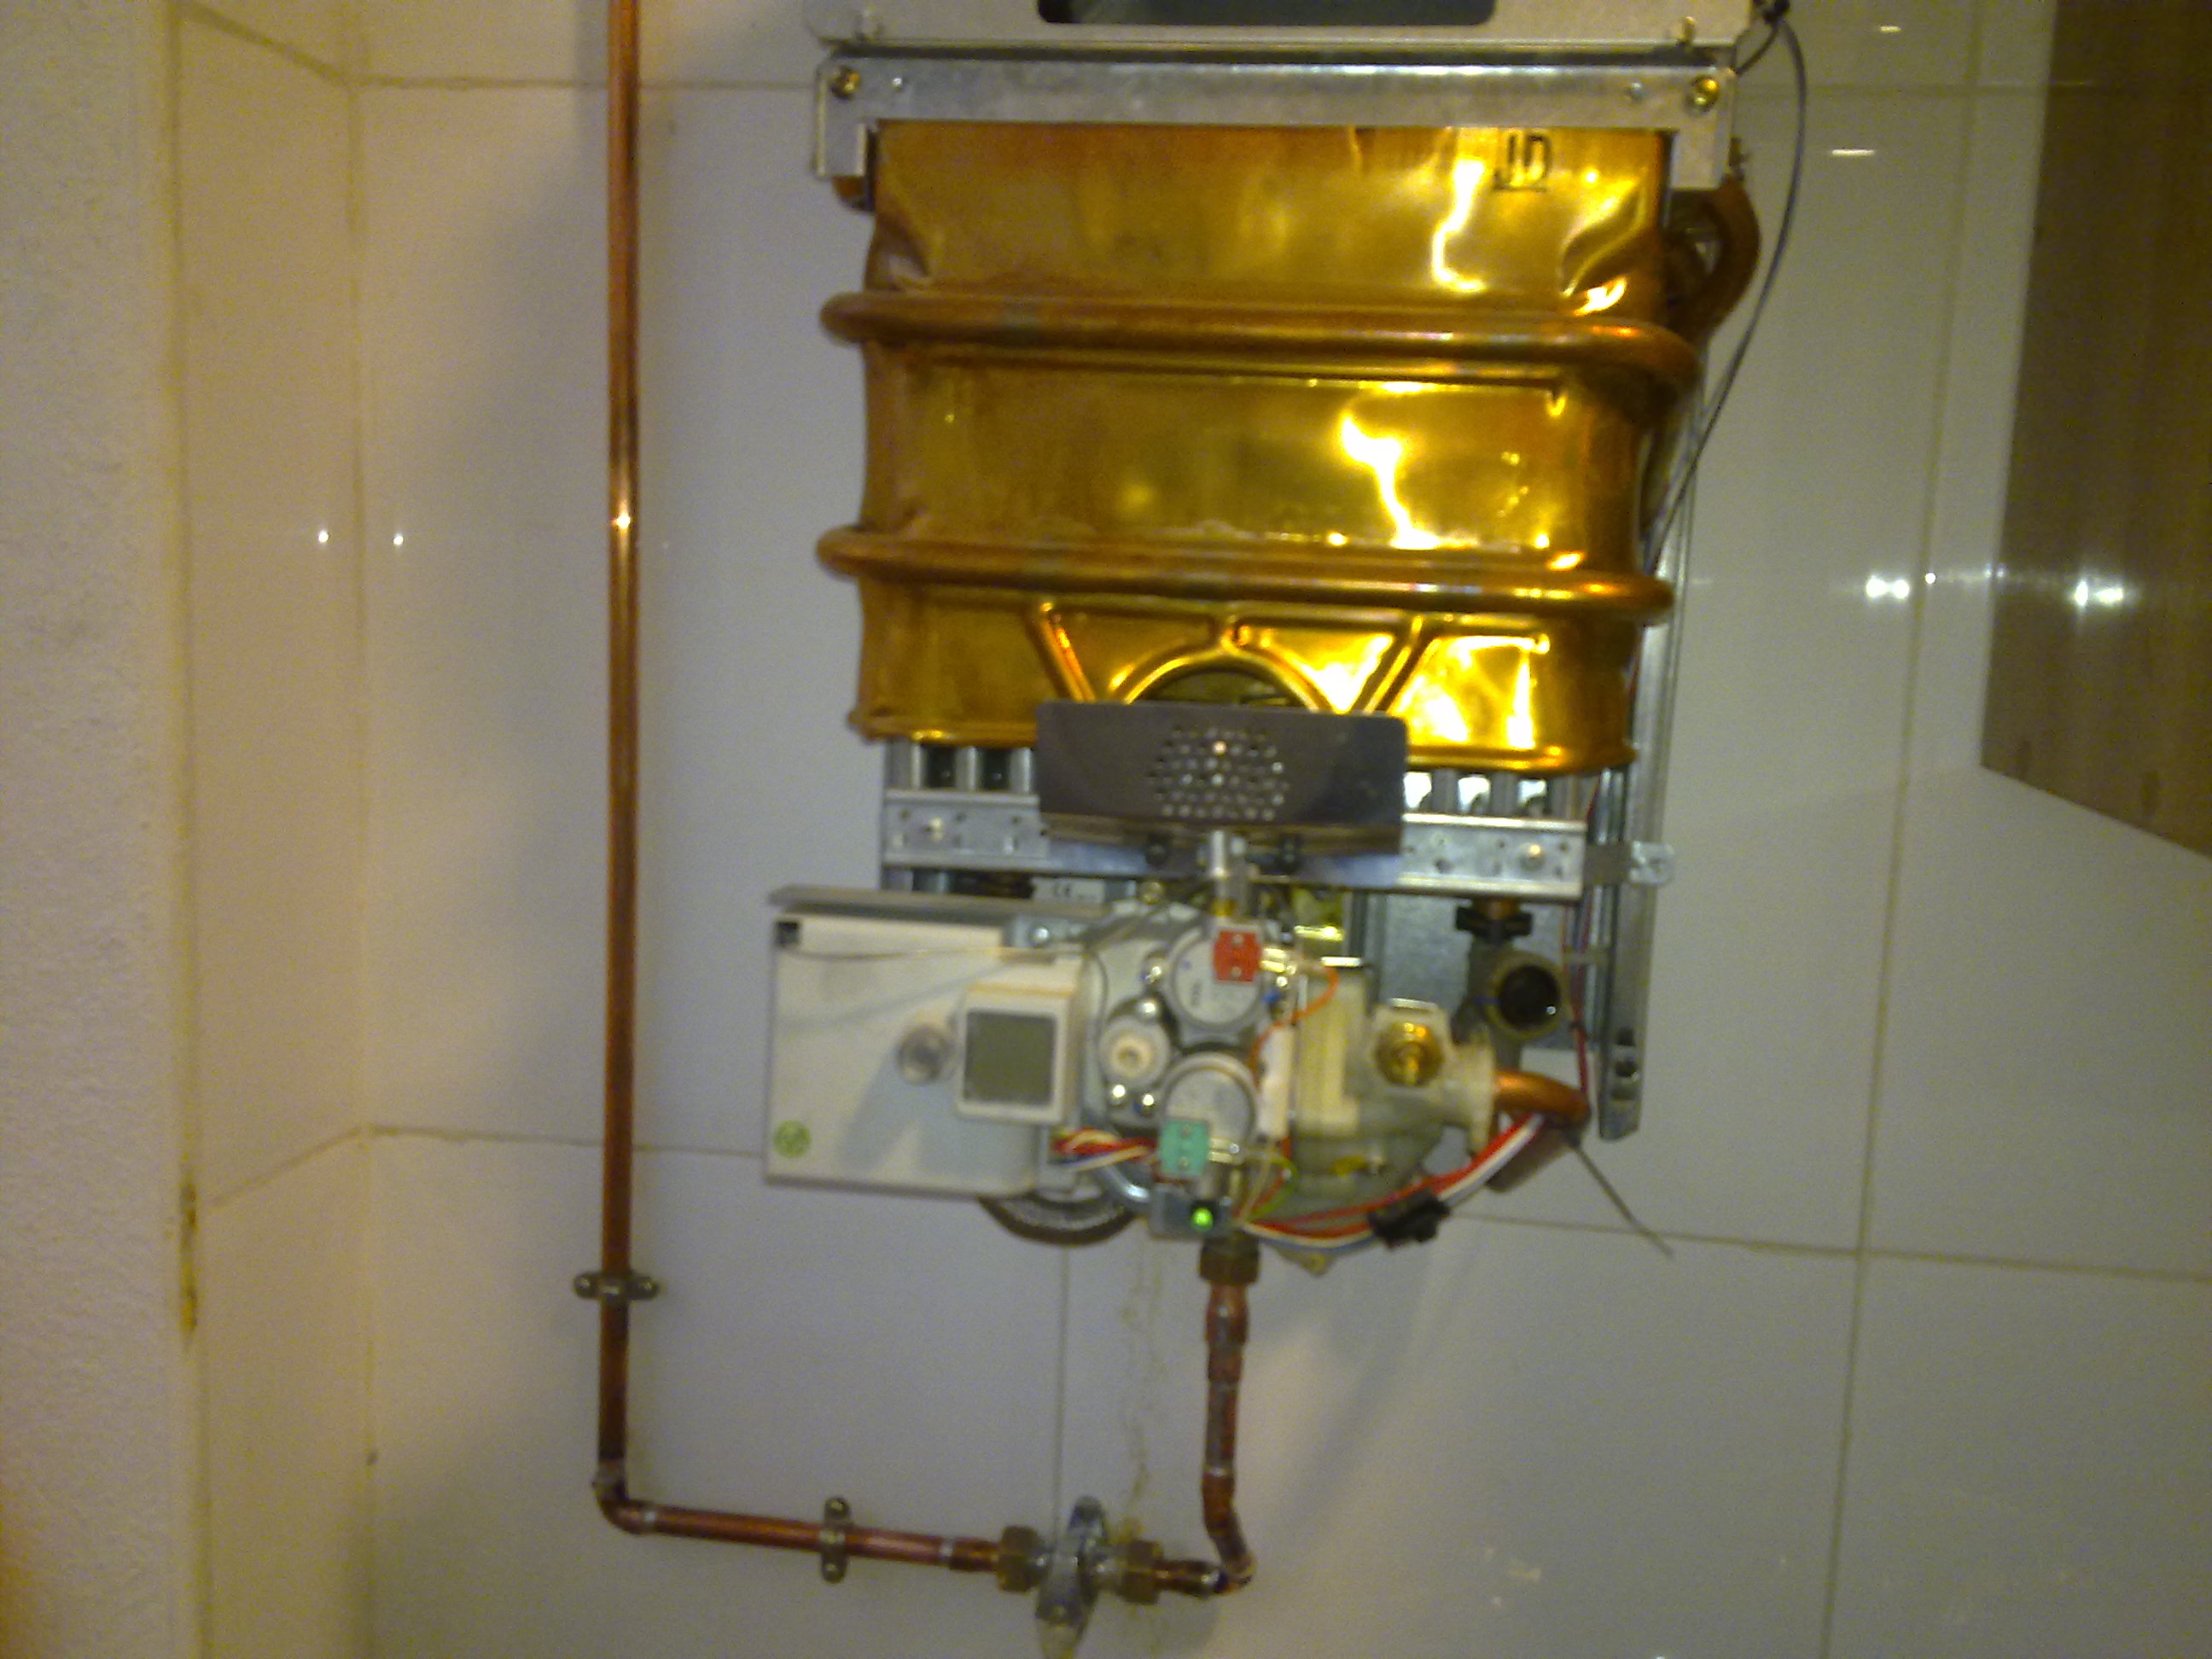 Cambiar inyectores calentador de gas natural a butano - Instalacion calentador gas natural ...